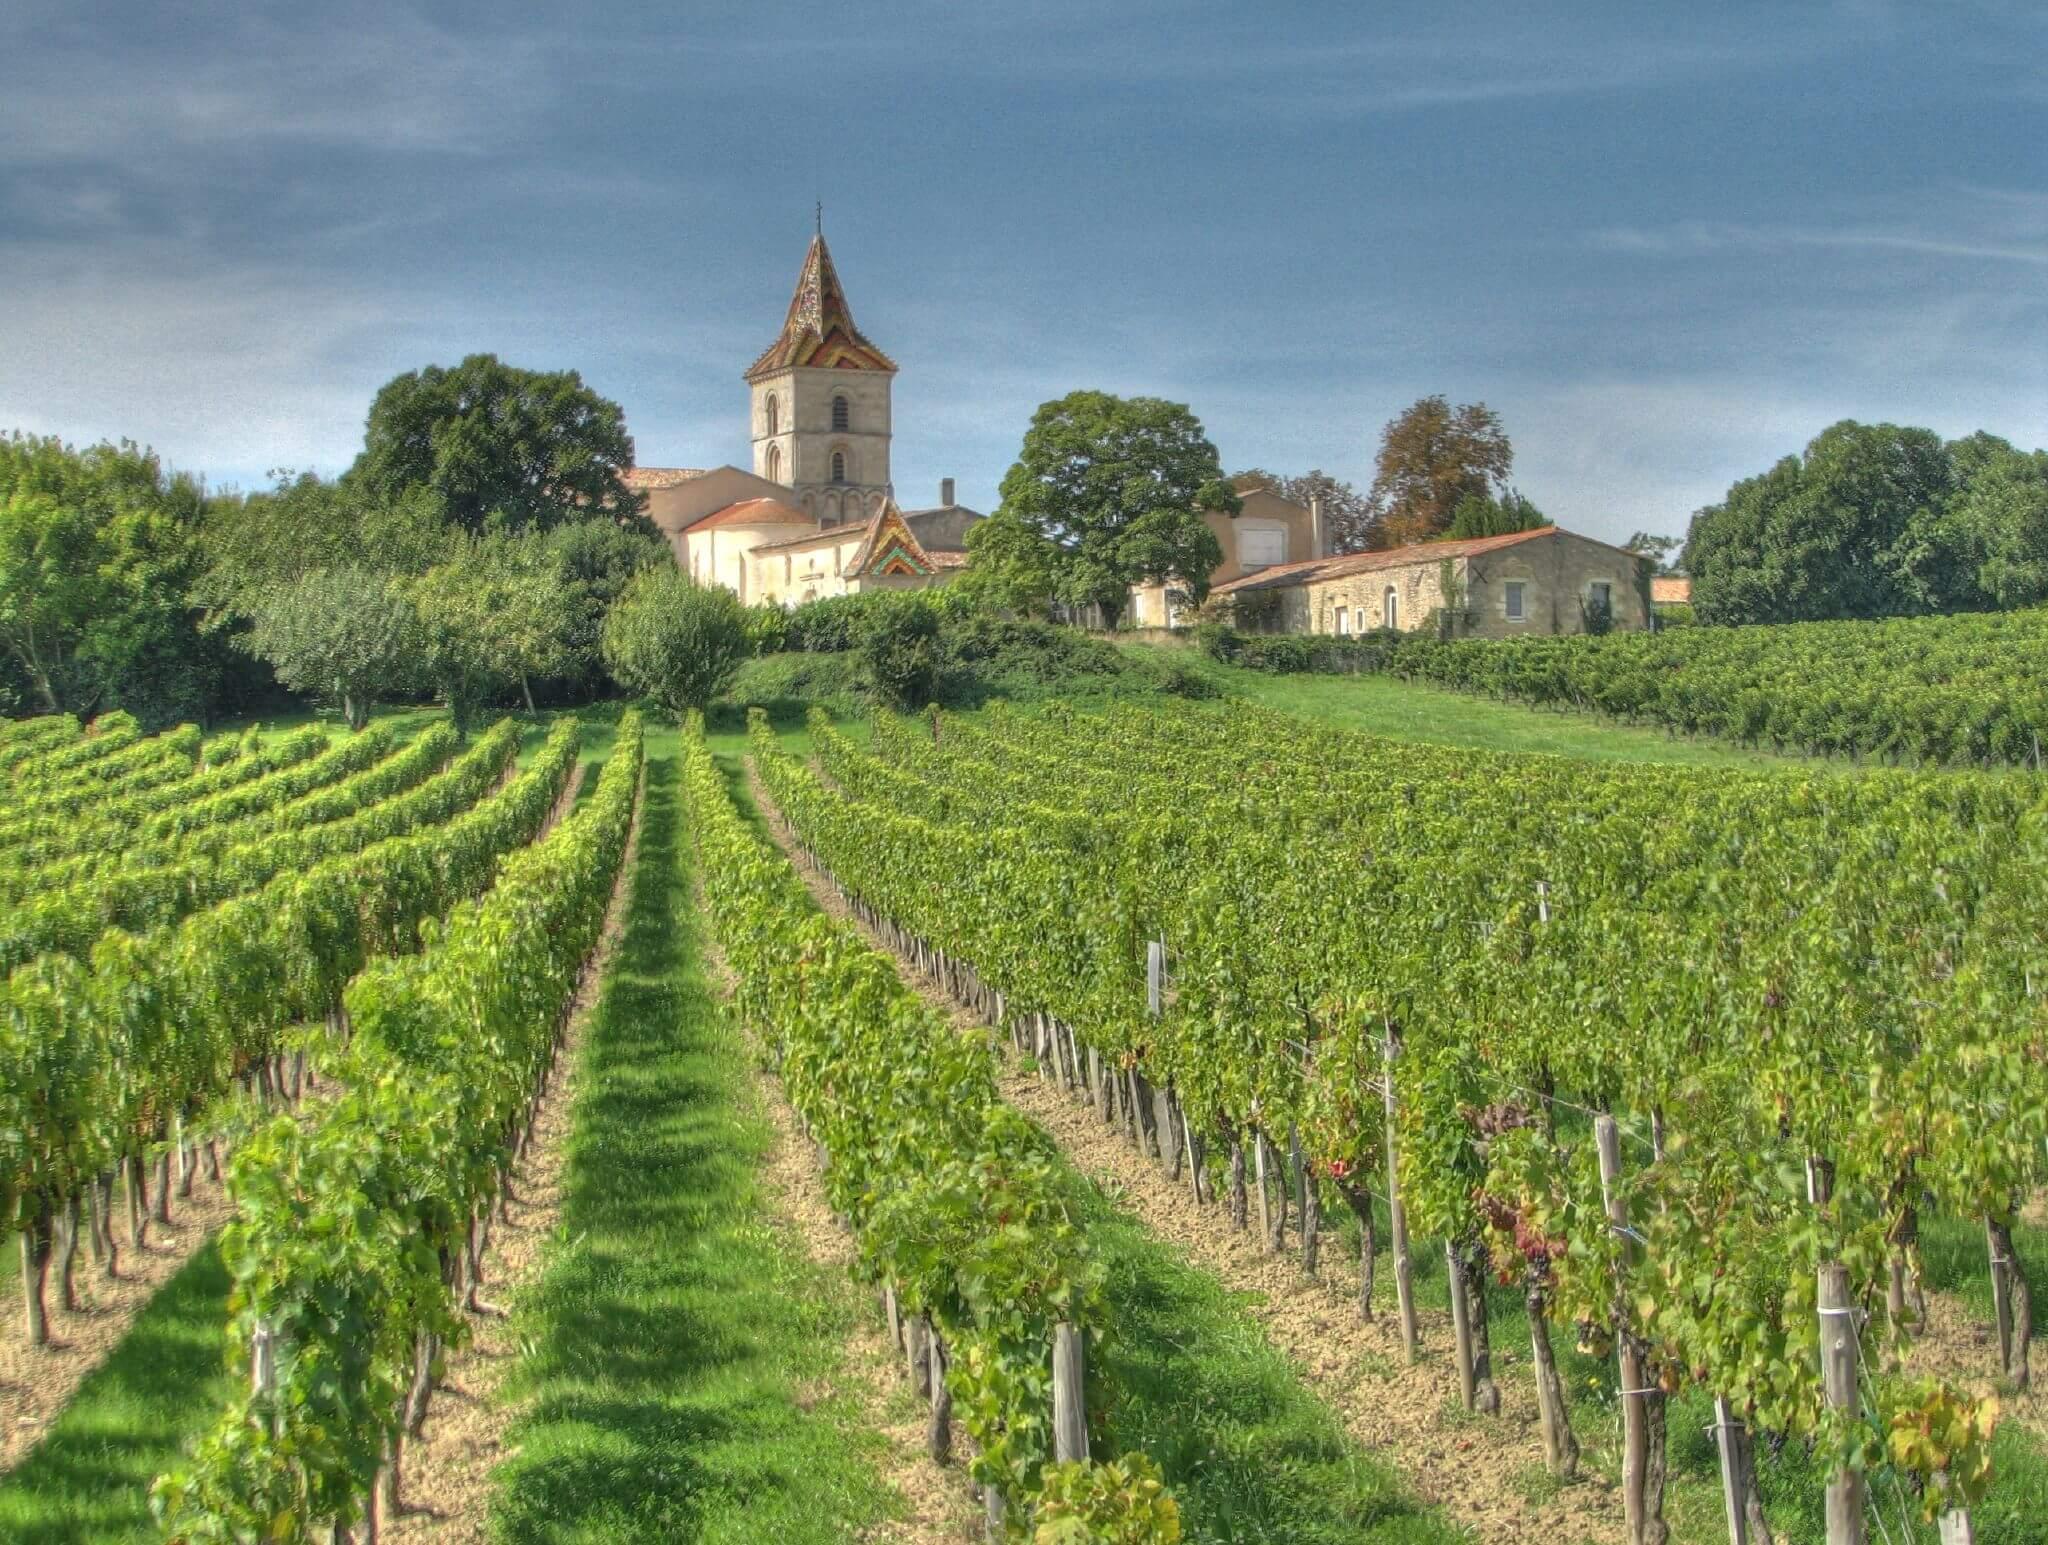 vùng trồng nho Languedoc-Roussillon